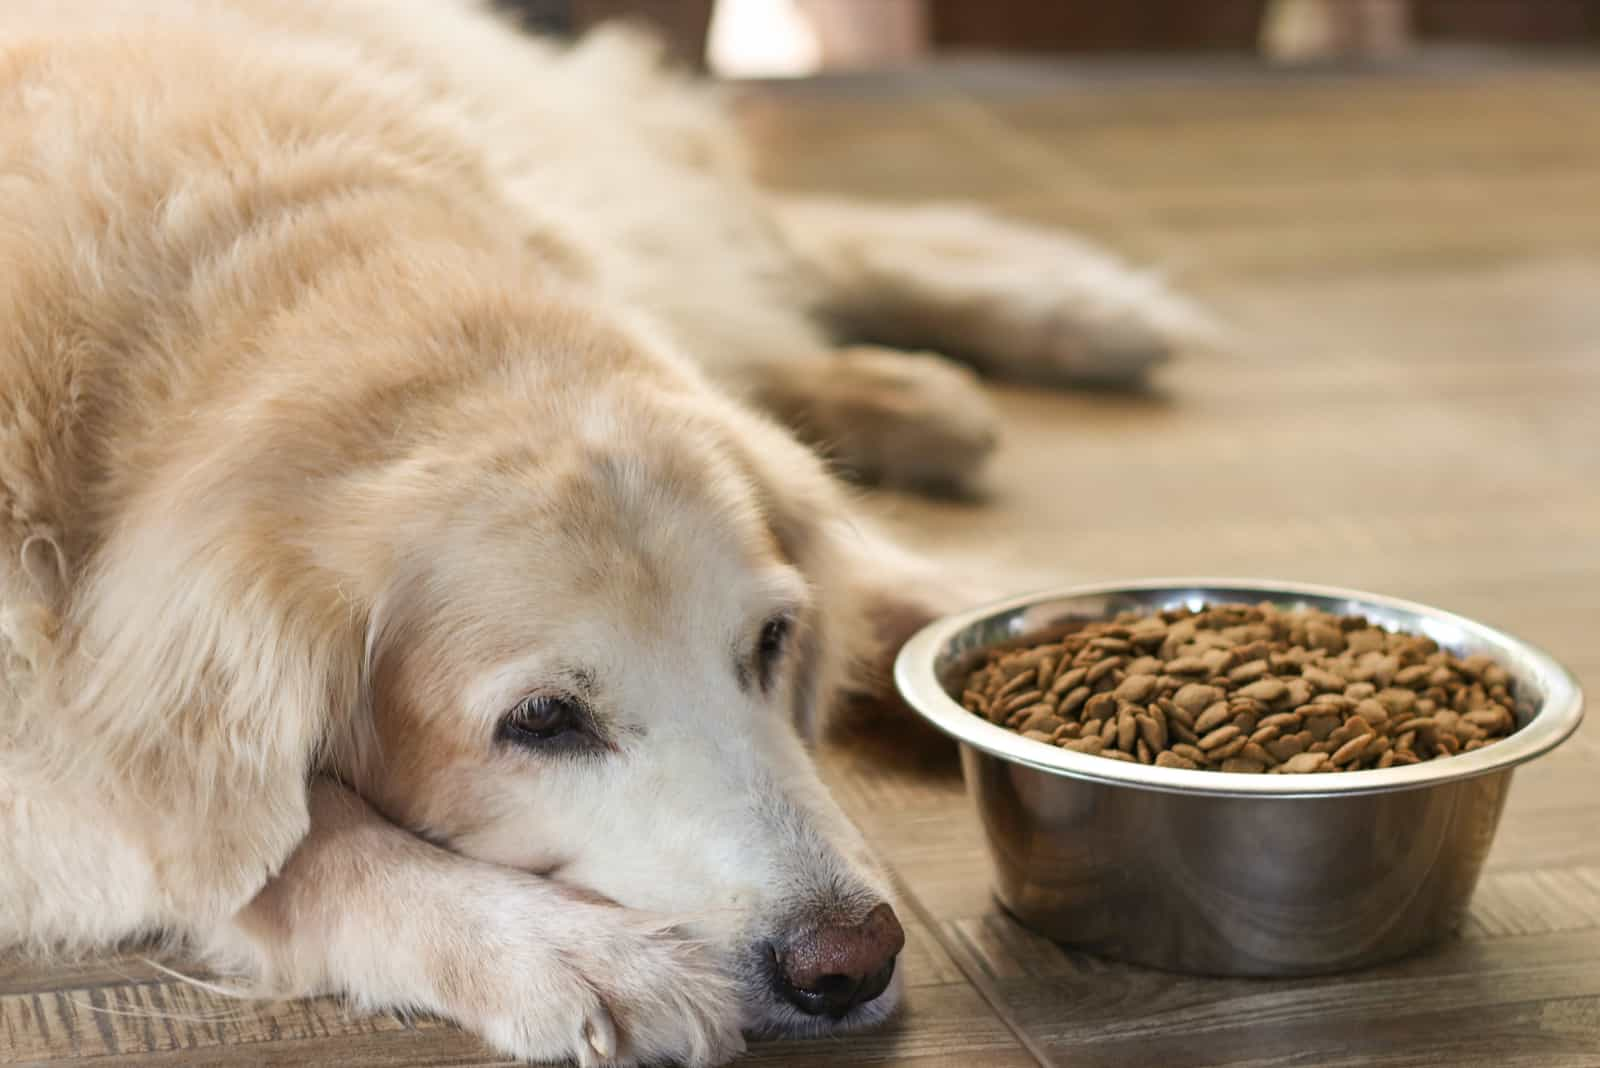 Der traurige alte Labrador Retriever lehnt das Essen ab